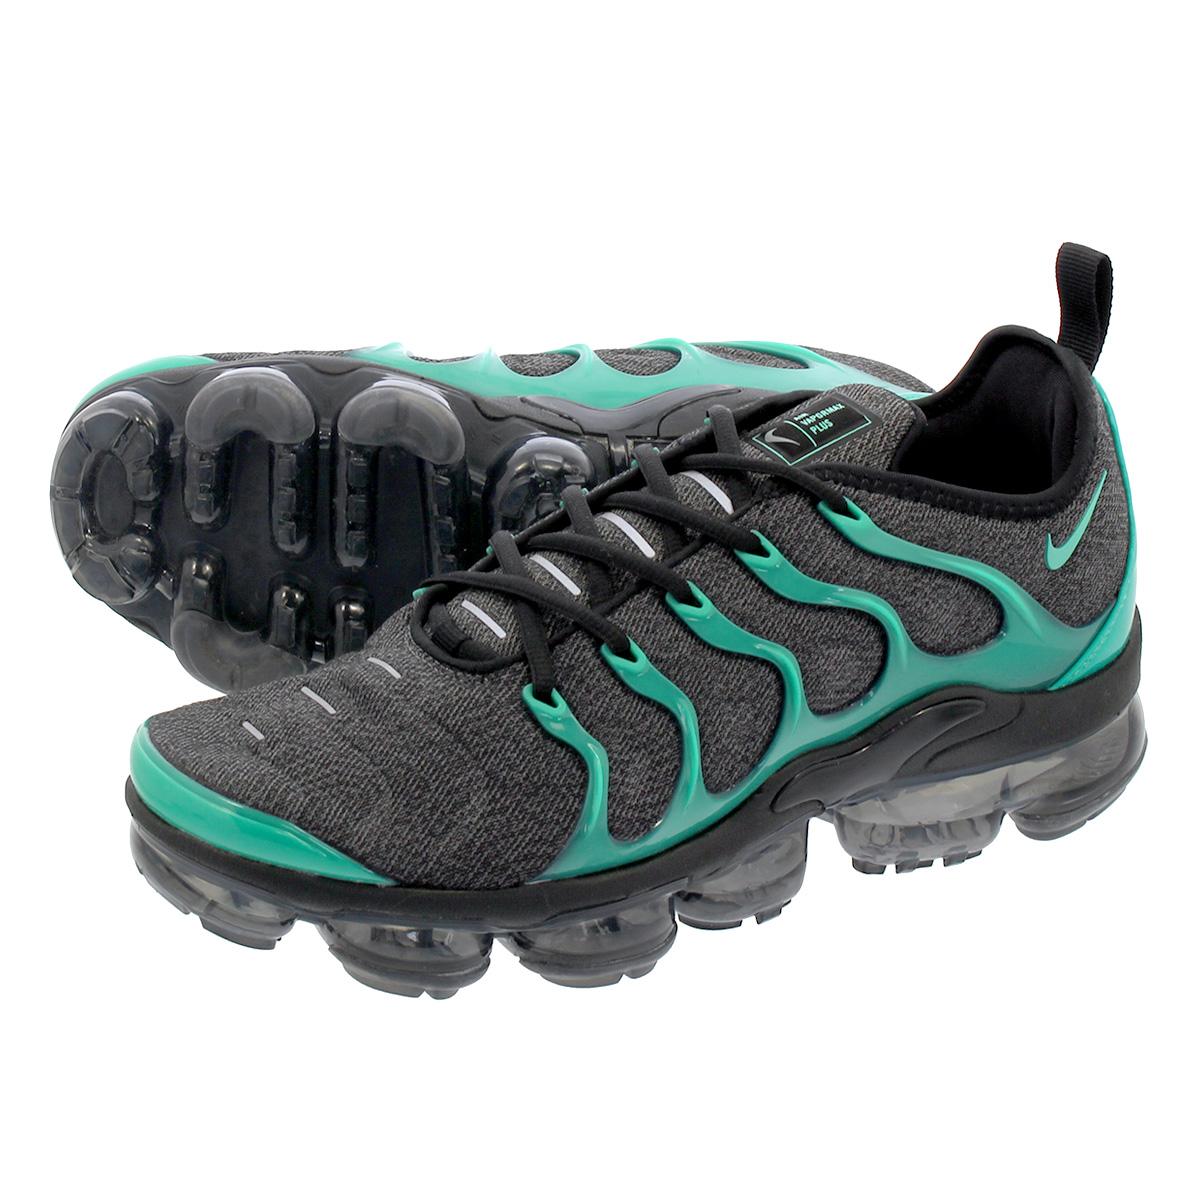 cac0c1b290b1e LOWTEX PLUS: NIKE AIR VAPORMAX PLUS Nike vapor max plus BLACK/GREEN 924,453- 013 | Rakuten Global Market